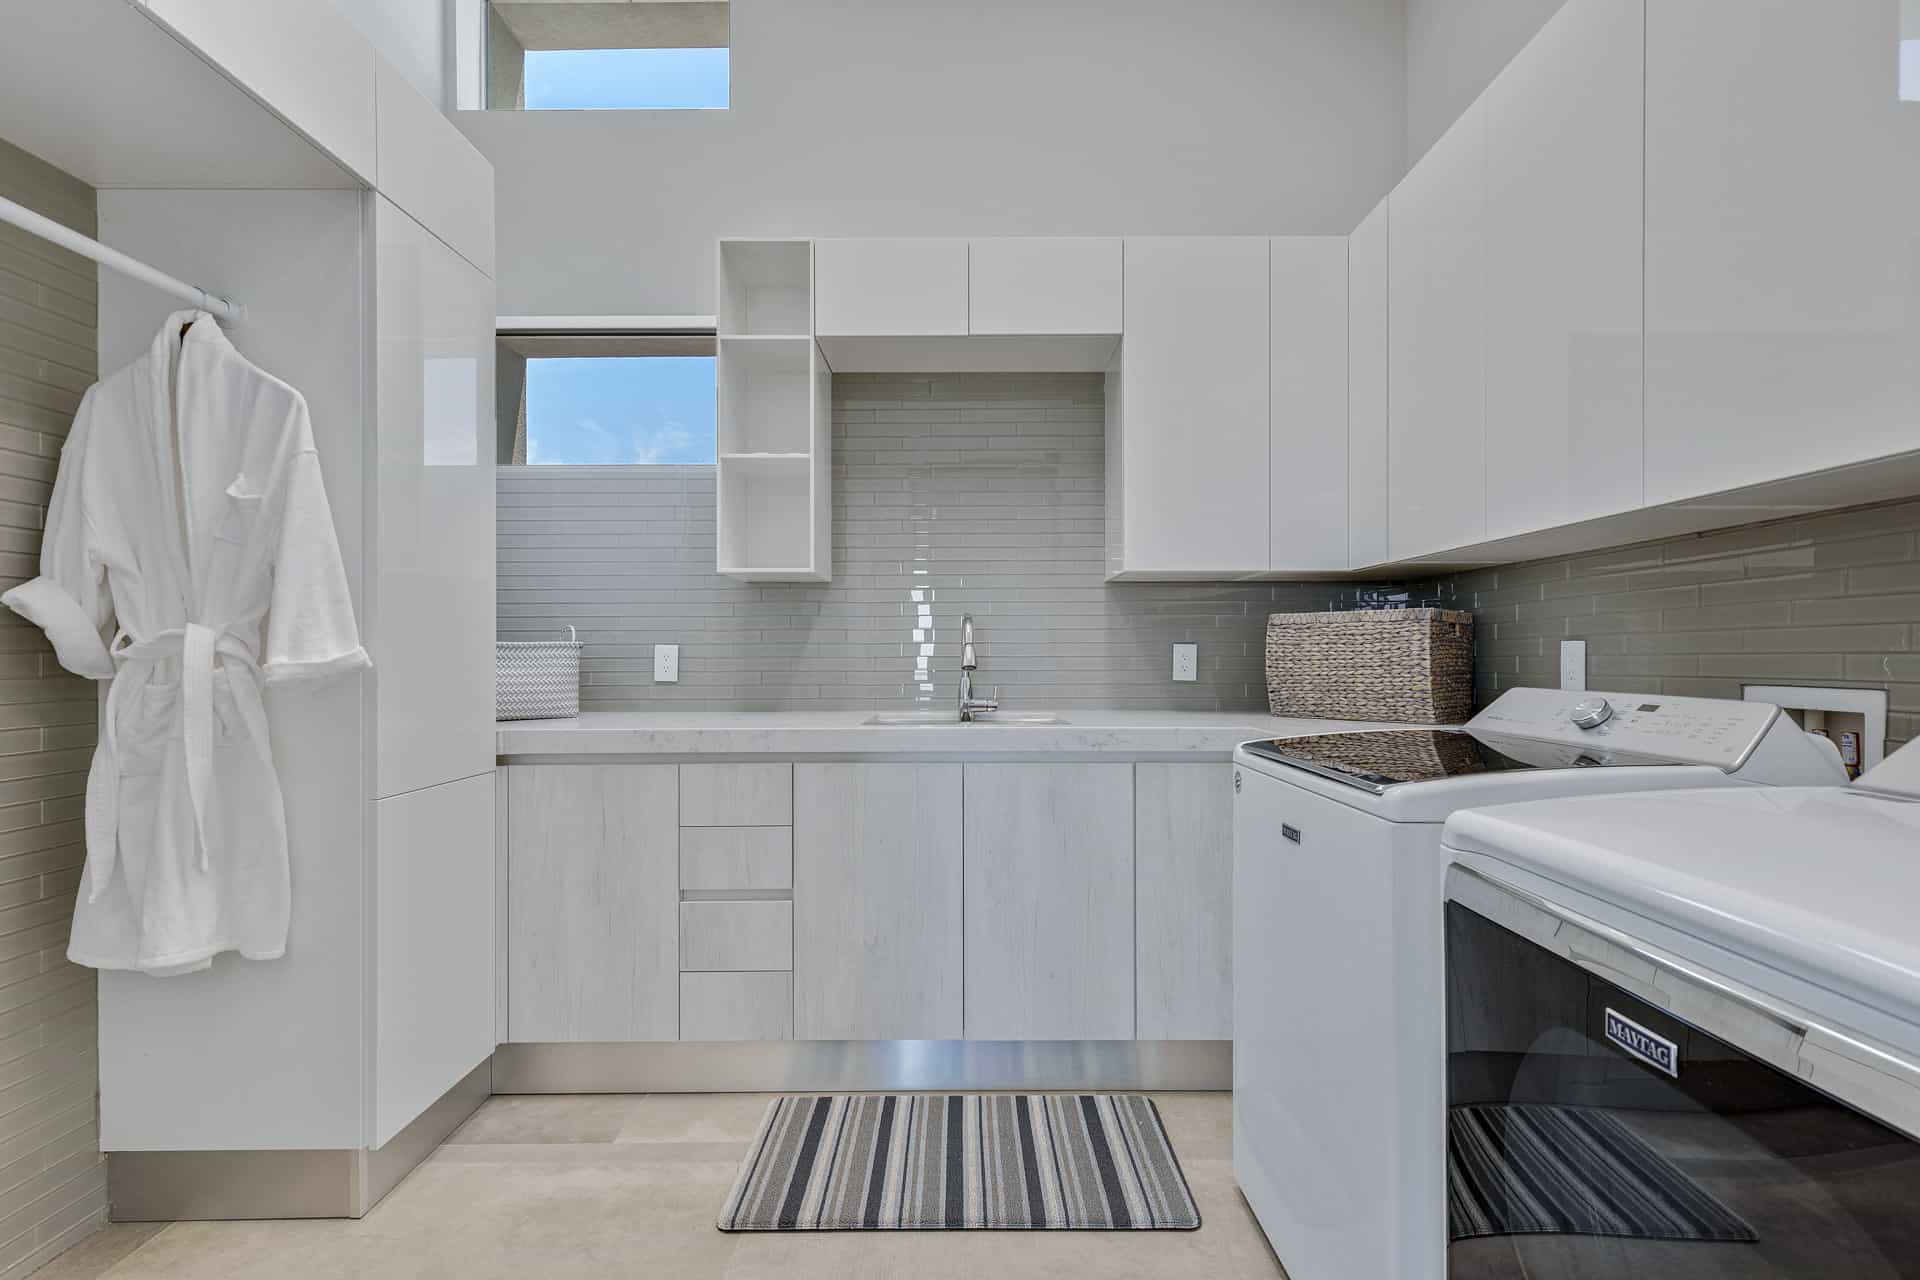 las-vegas-luxry-real-estate-realtor-rob-jensen-company-5-rockstream-drive-ascaya042